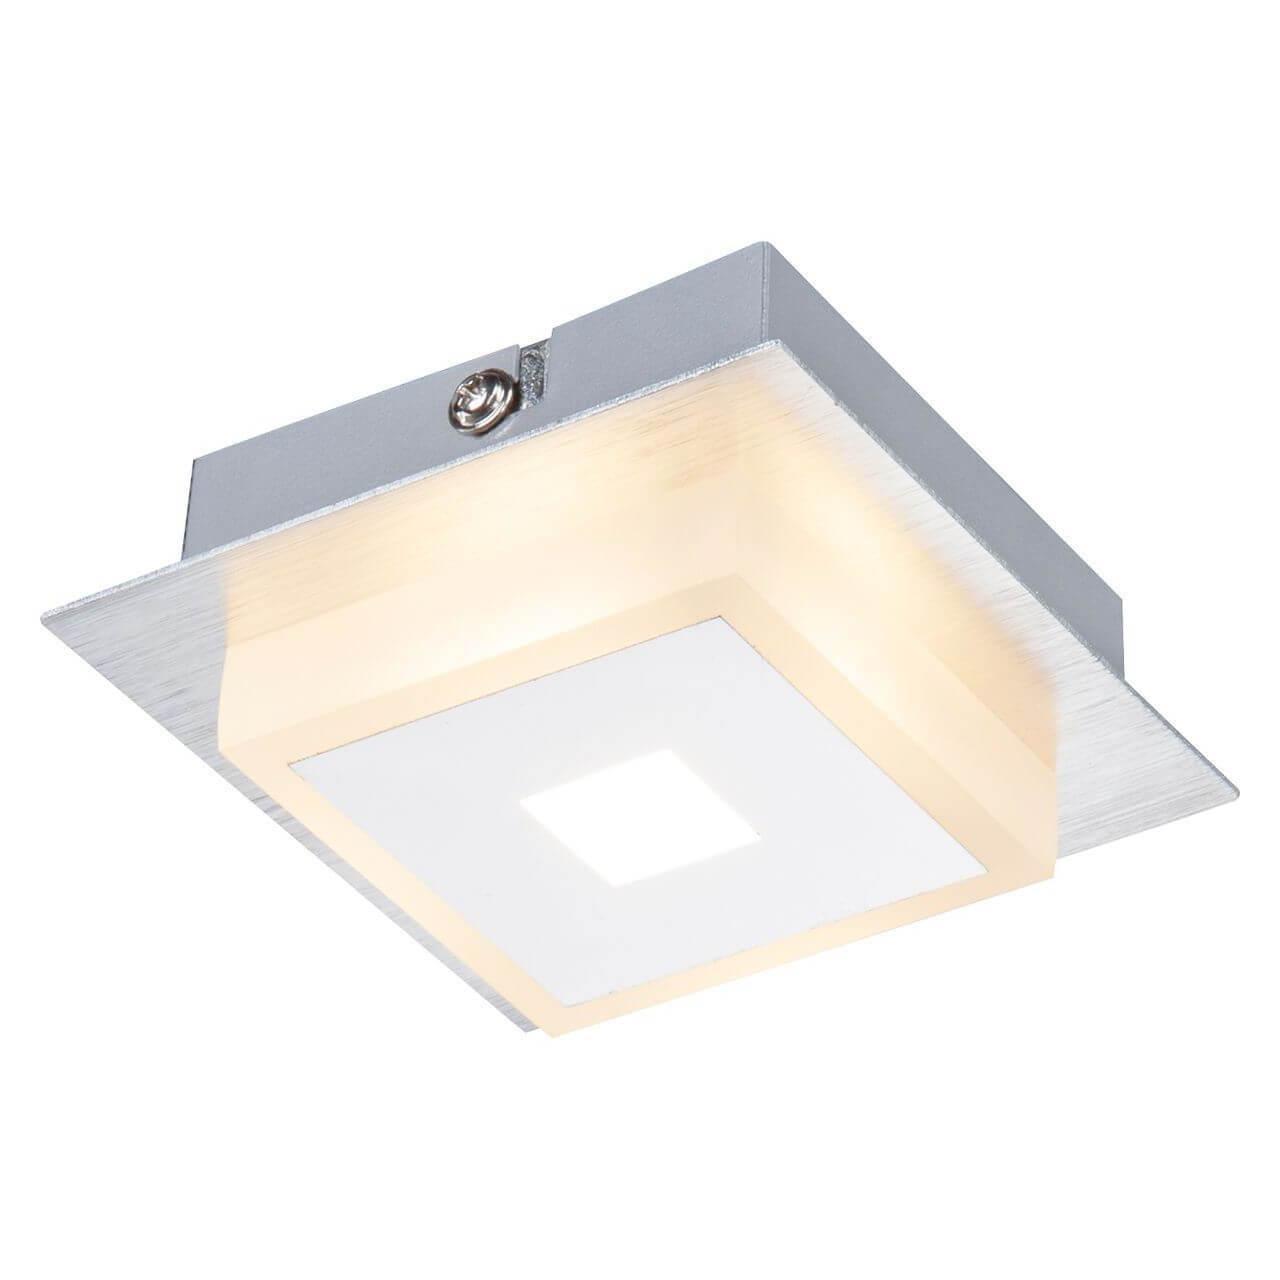 Накладной светильник Globo 41111-1, LED, 5 Вт накладной светильник globo claire 48077